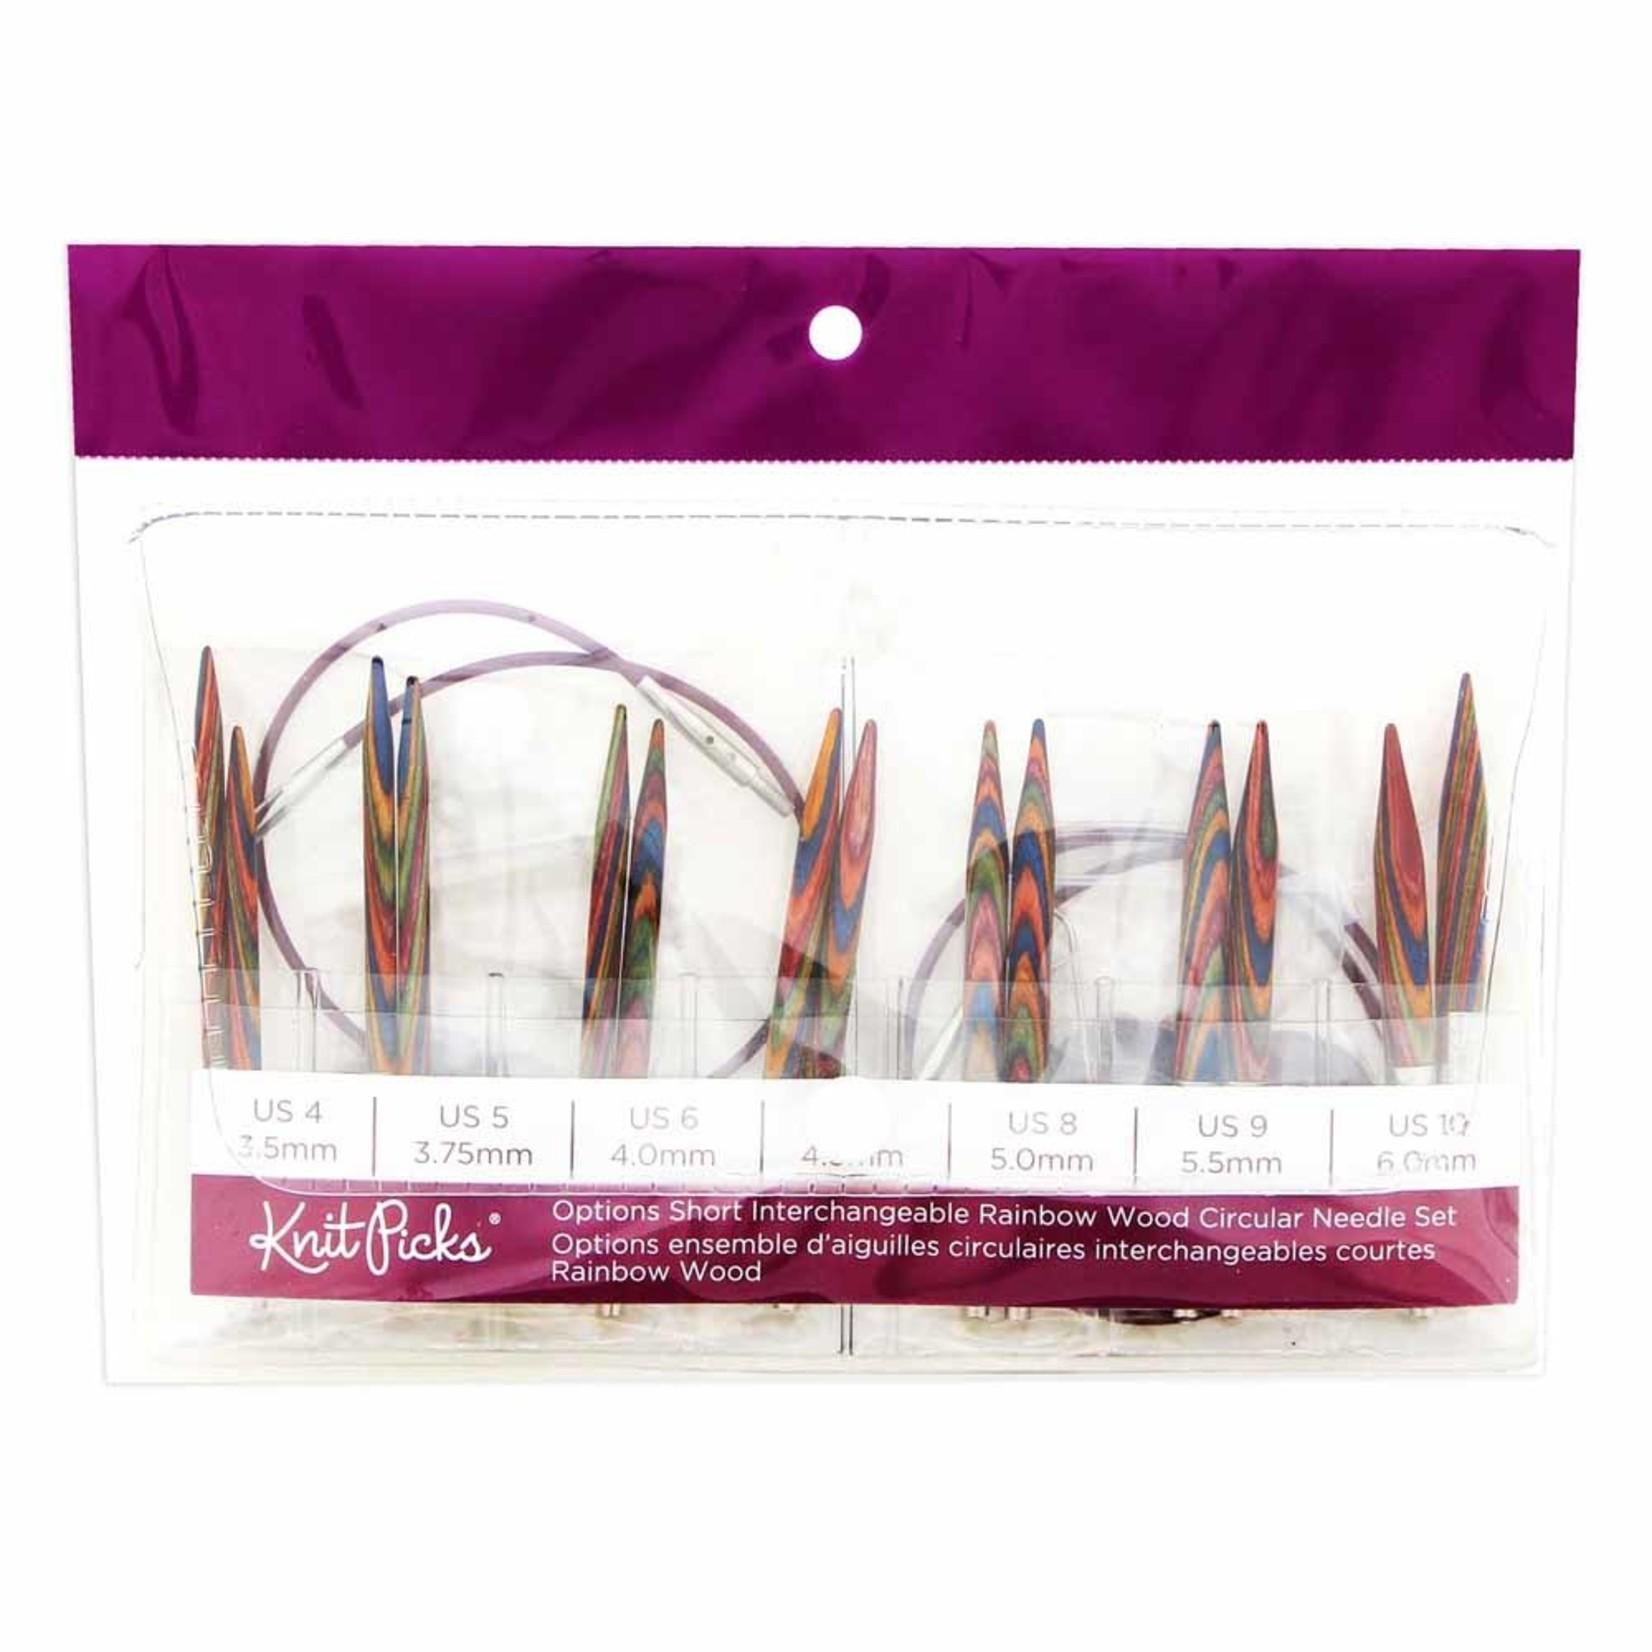 Knit Picks KNIT PICKS Rainbow Wood Options Short Interchangeable Circular Needle Set